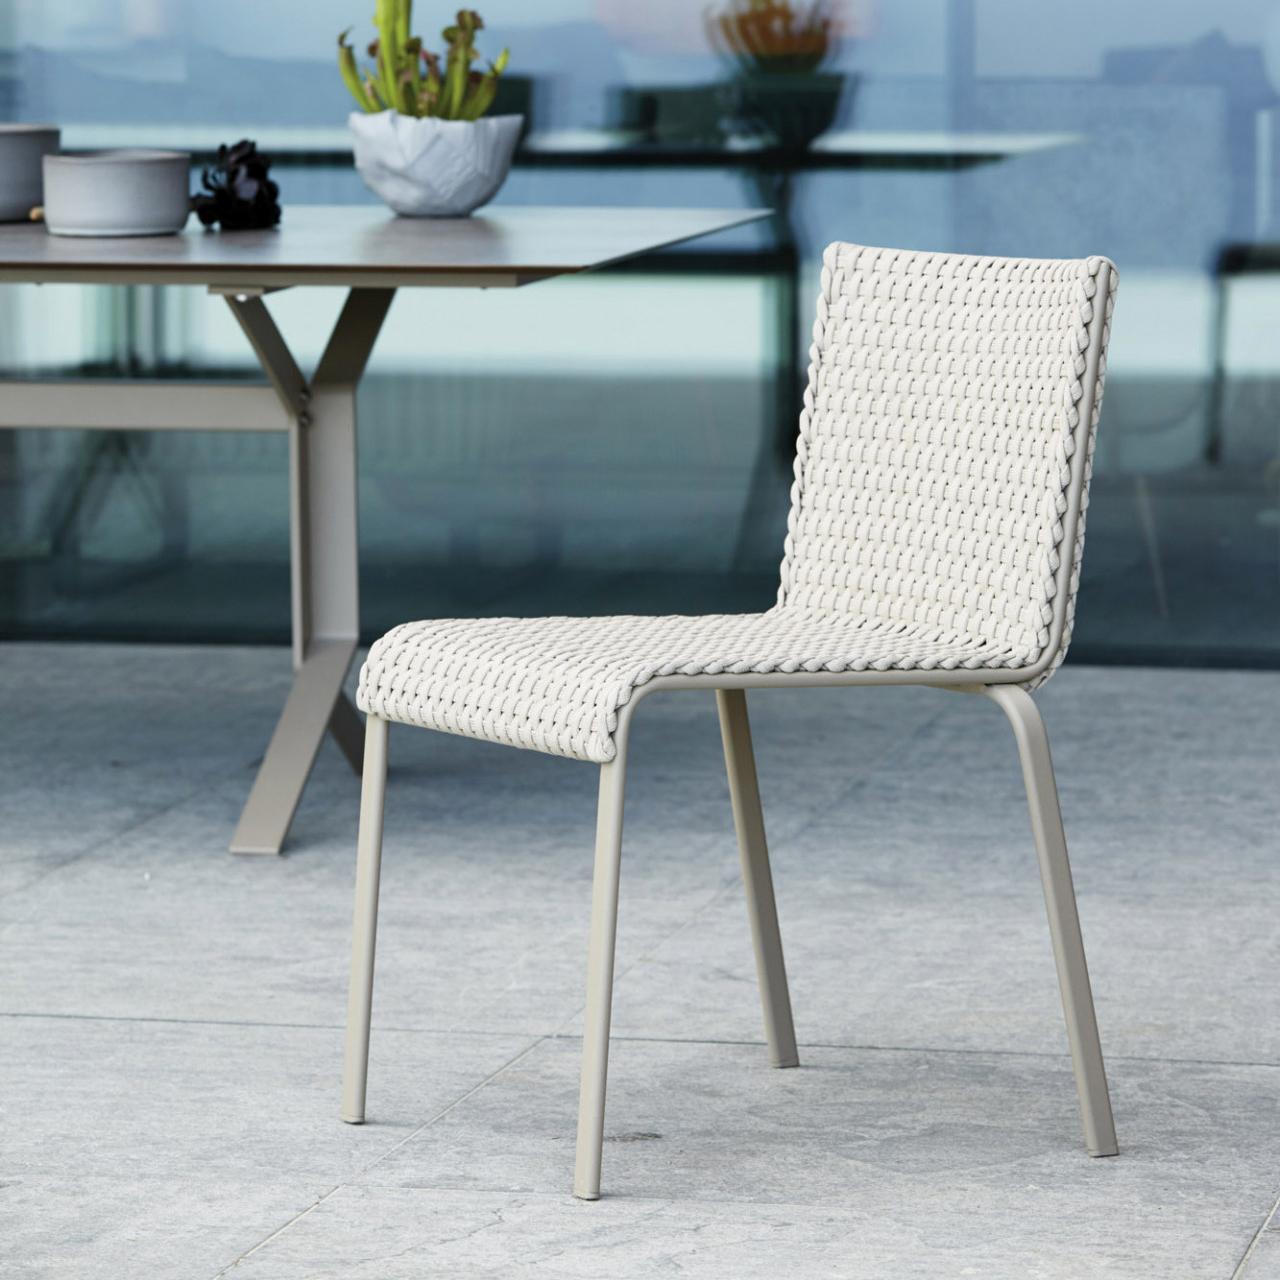 Key West Luxury Italian Designer Chair